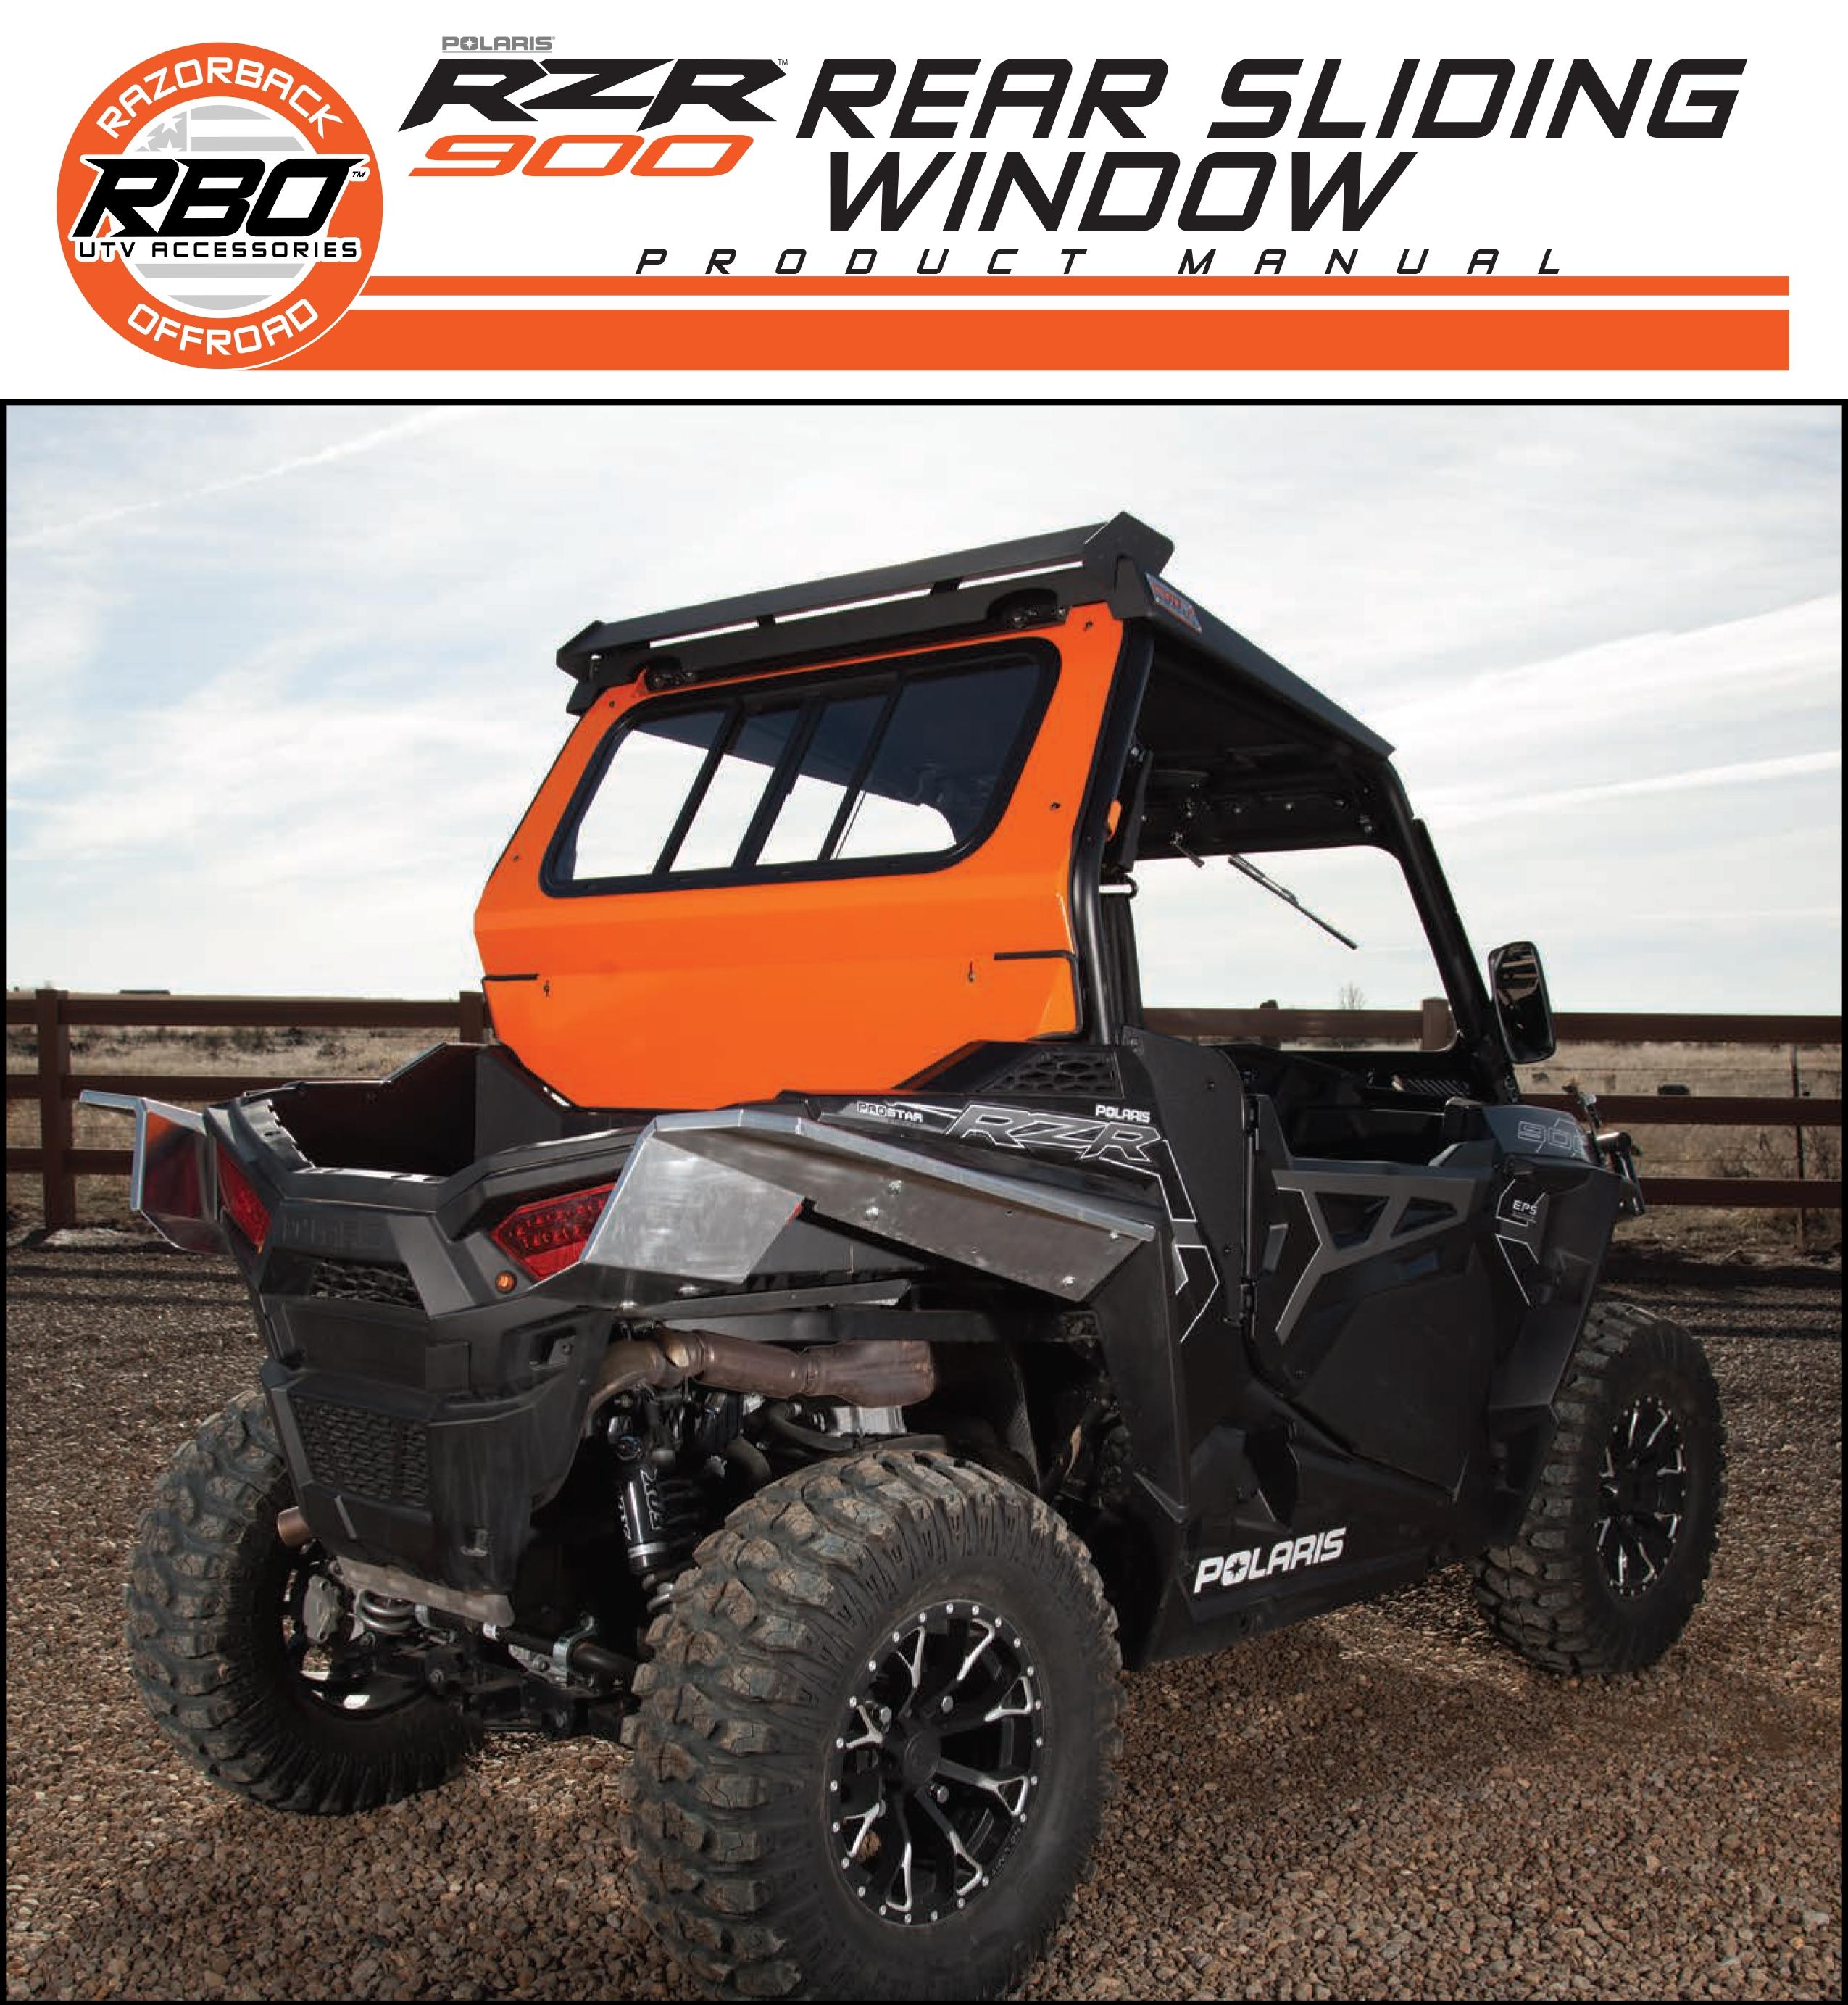 RBO Poalris RZR 900 Rear Sliding Window Product Manual